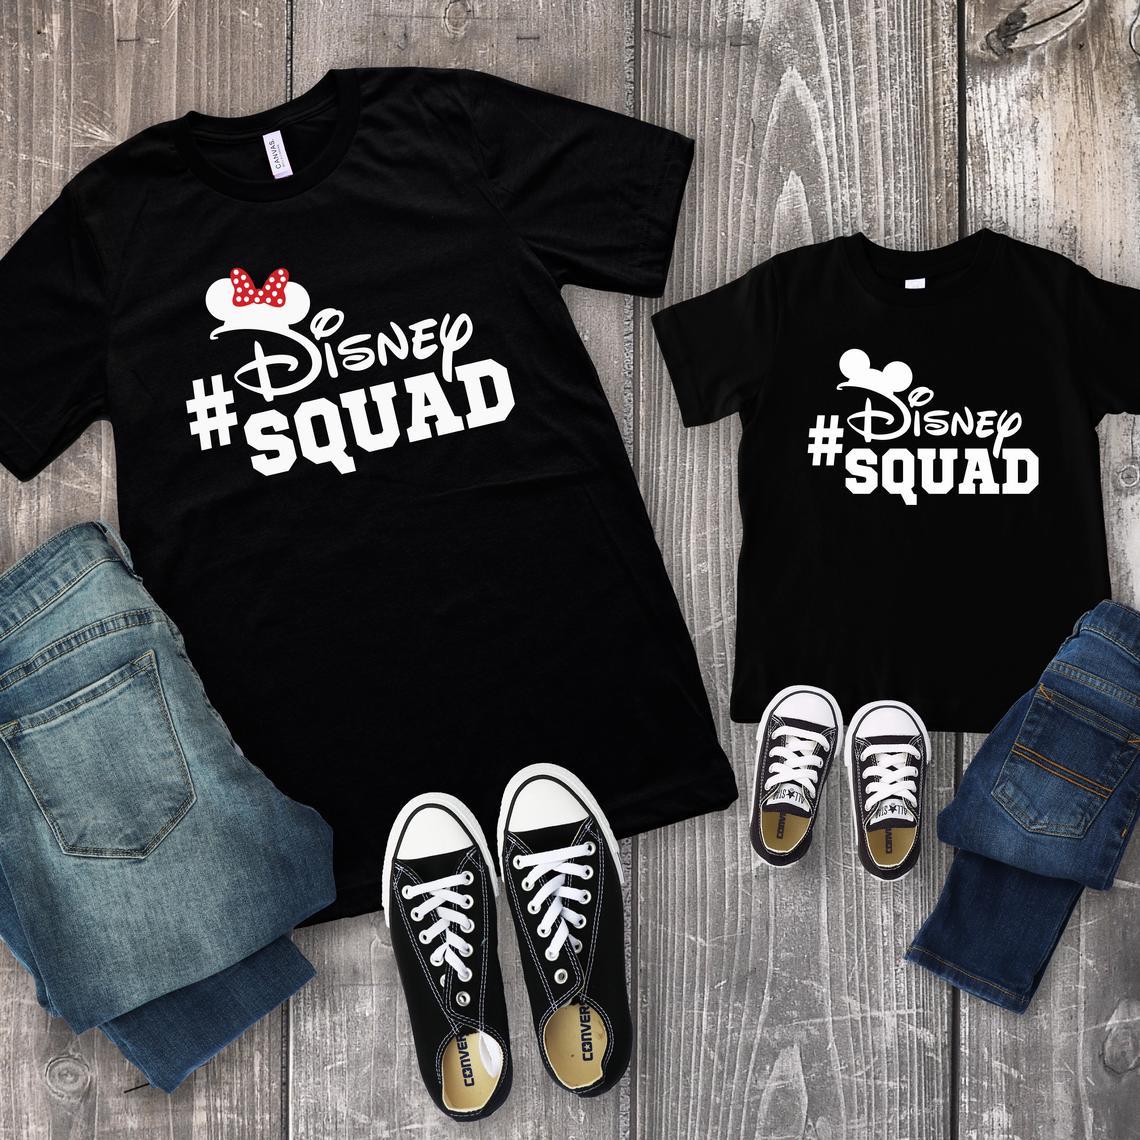 Disney Family Shirts - Custom Disney Shirts to Wear to Disney World